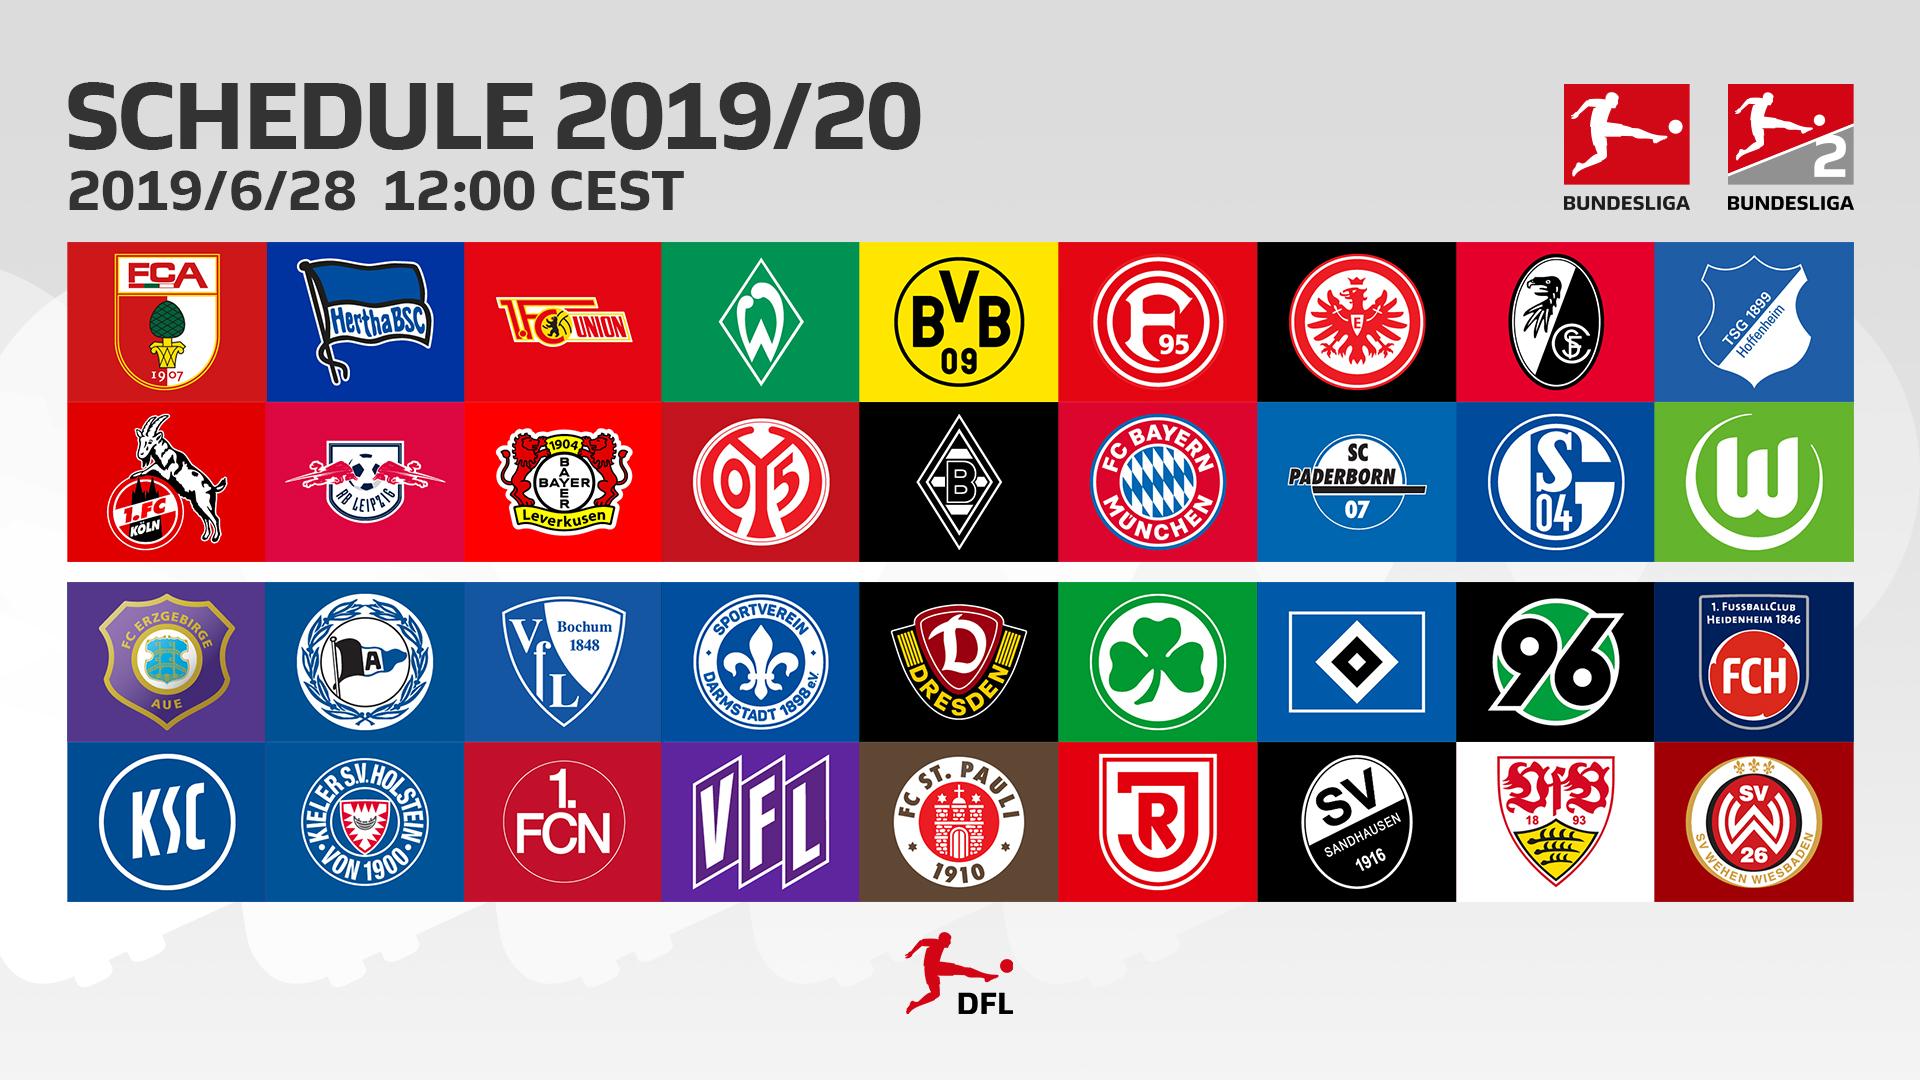 Bundesliga Weekend Fixtures Home Defeats And Less Goals Uzalendo News